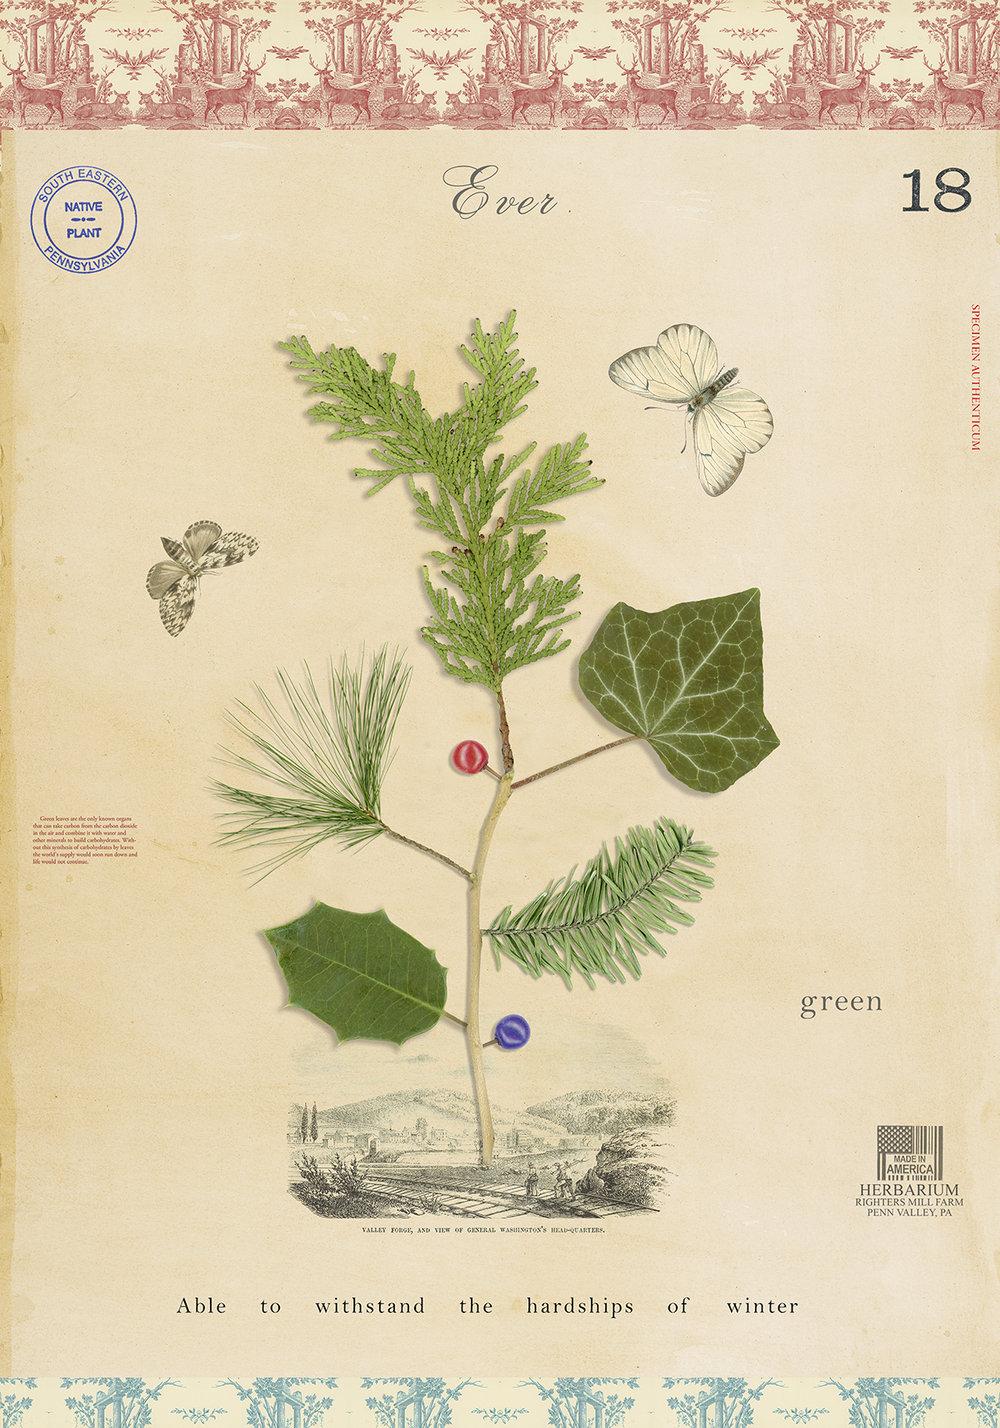 Evergreen - 20x14